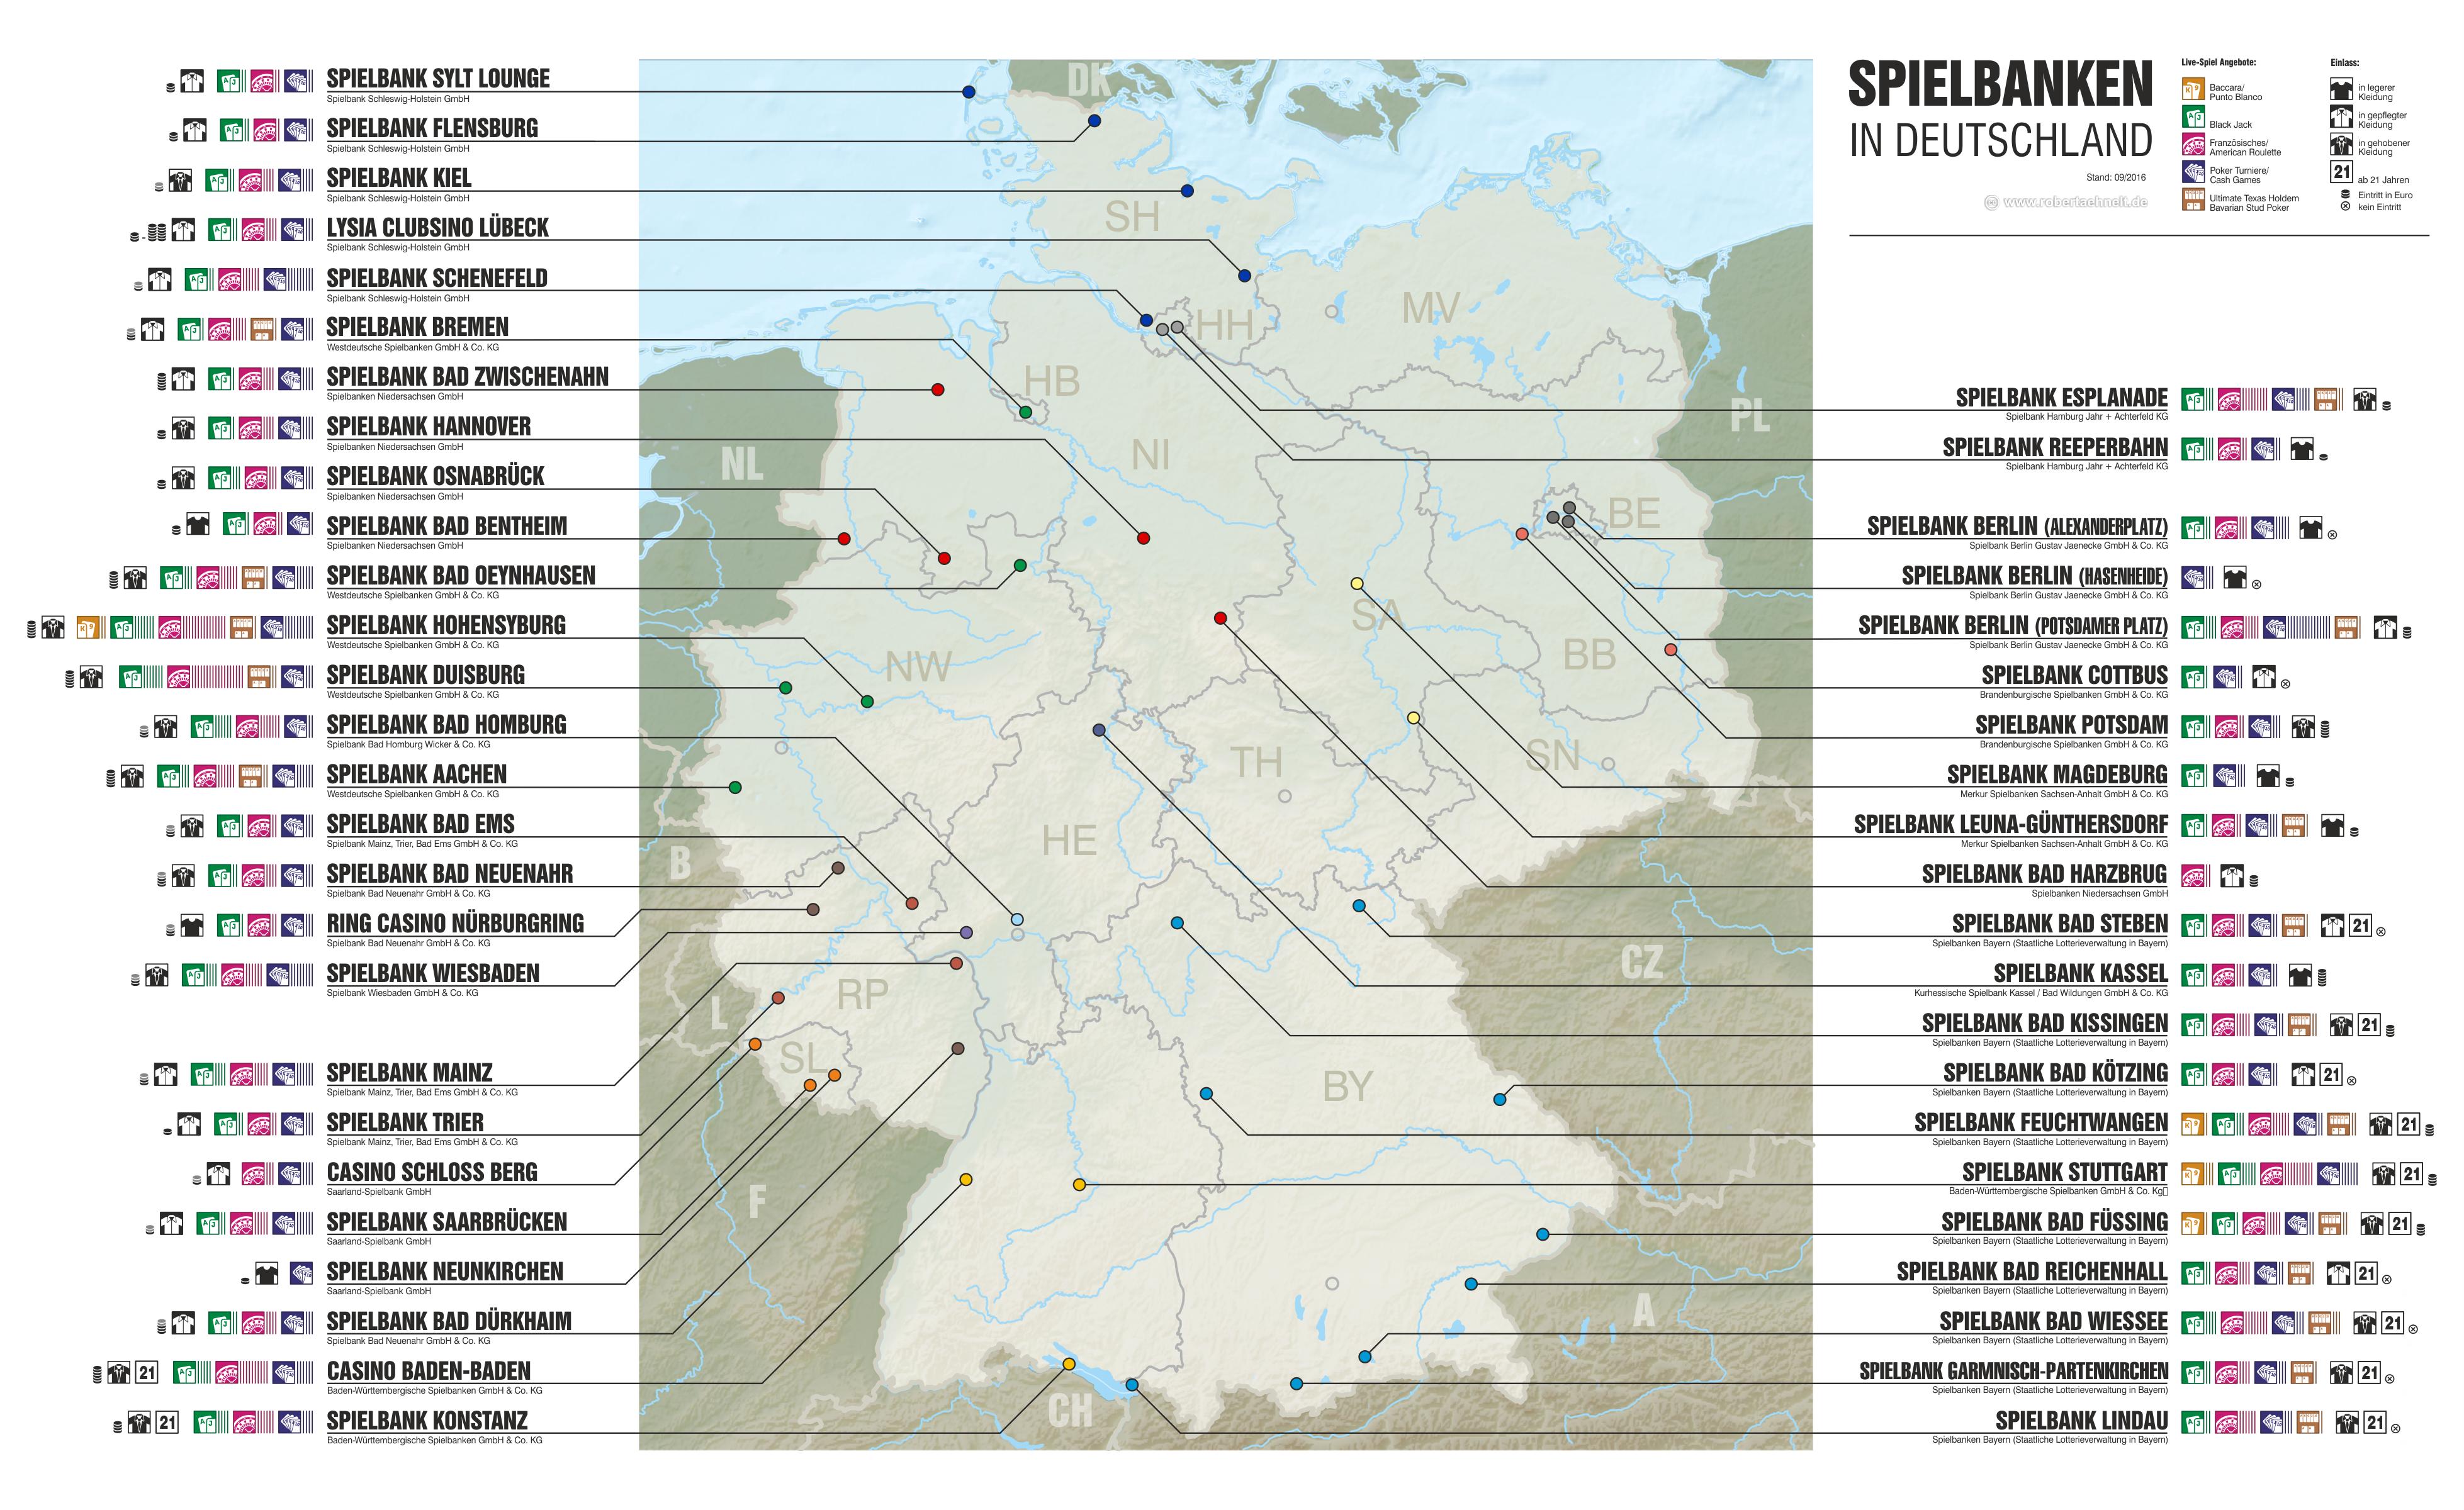 spielbank deutschland karte File:Spielbanken Deutschland.png   Wikimedia Commons